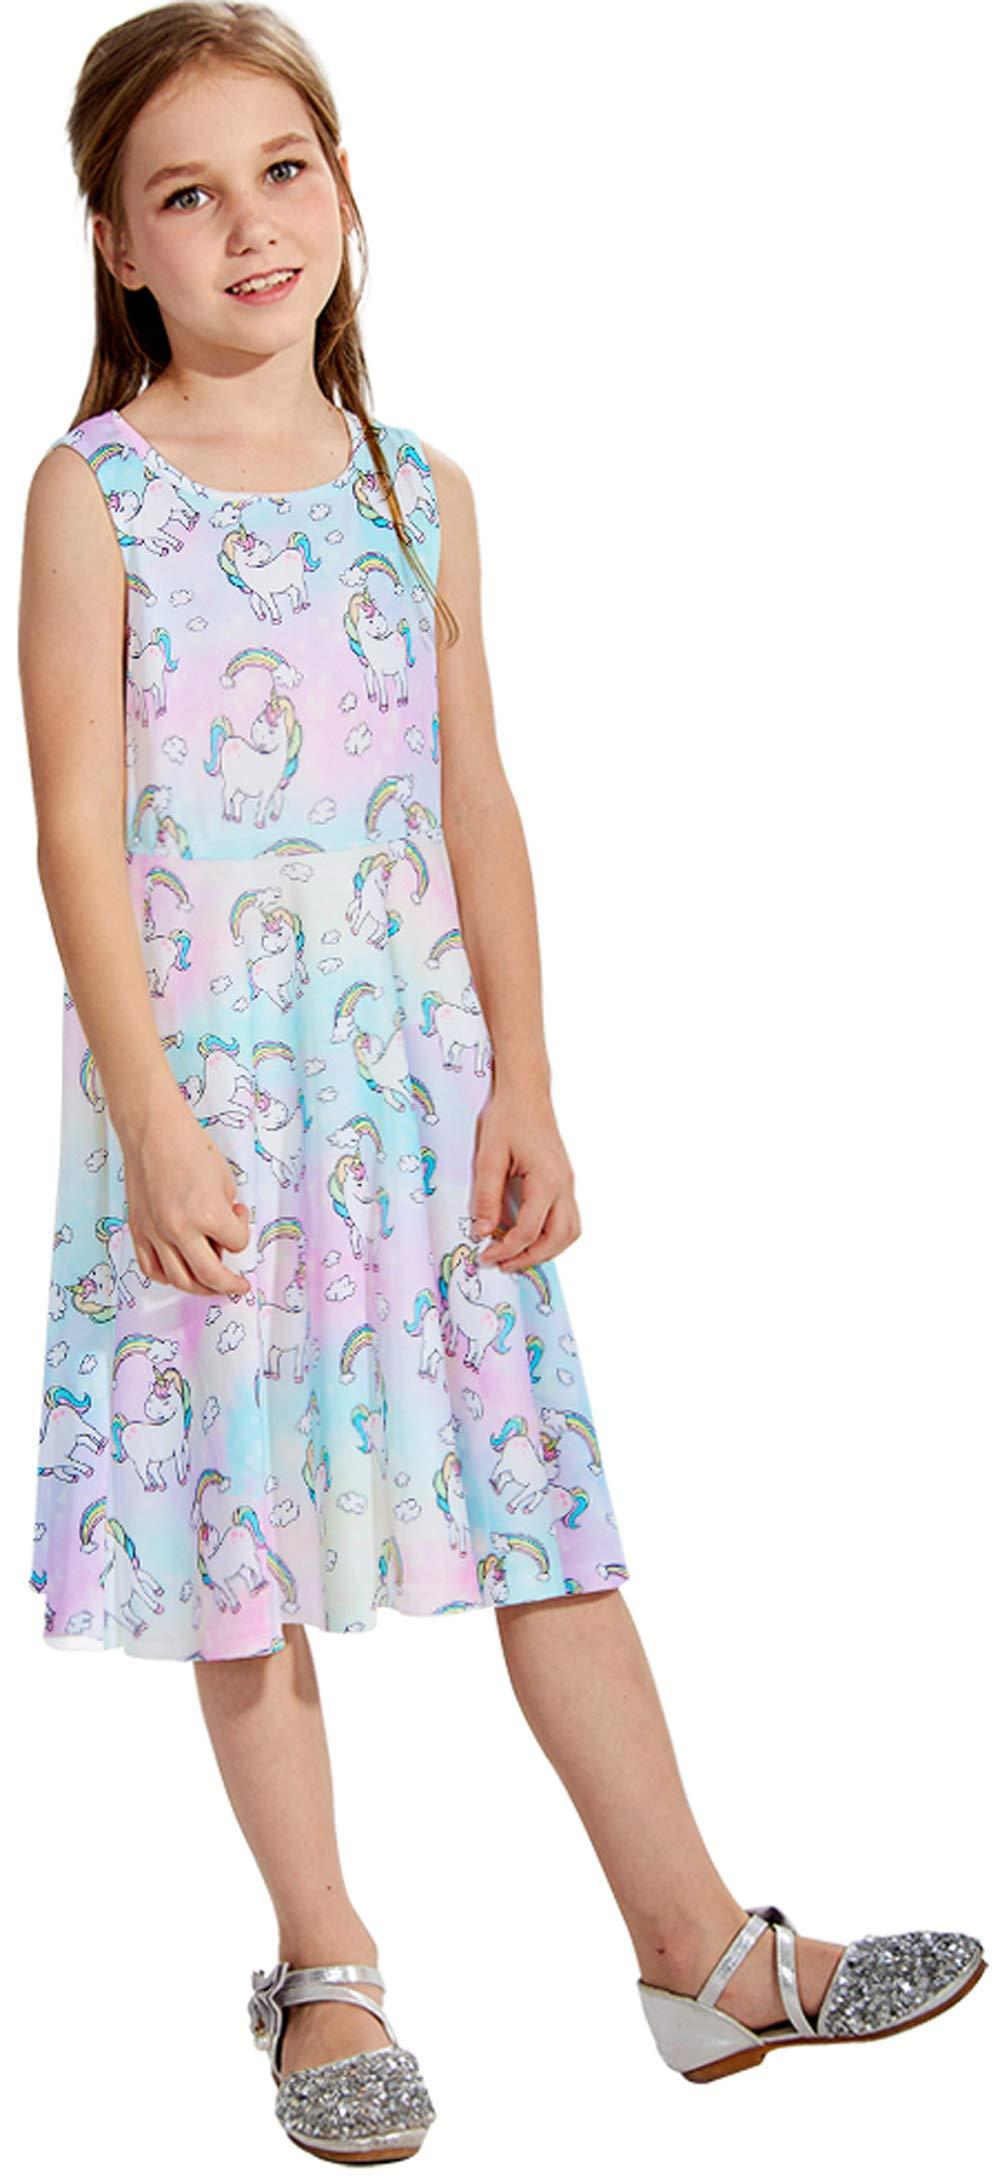 Kid\'s Round Neck Unicorn Dresses Vintage for Wedding Party Tutu Sundress Casual Dress for Girls Cocktail Picnic Dresses White M Size (6-7T)